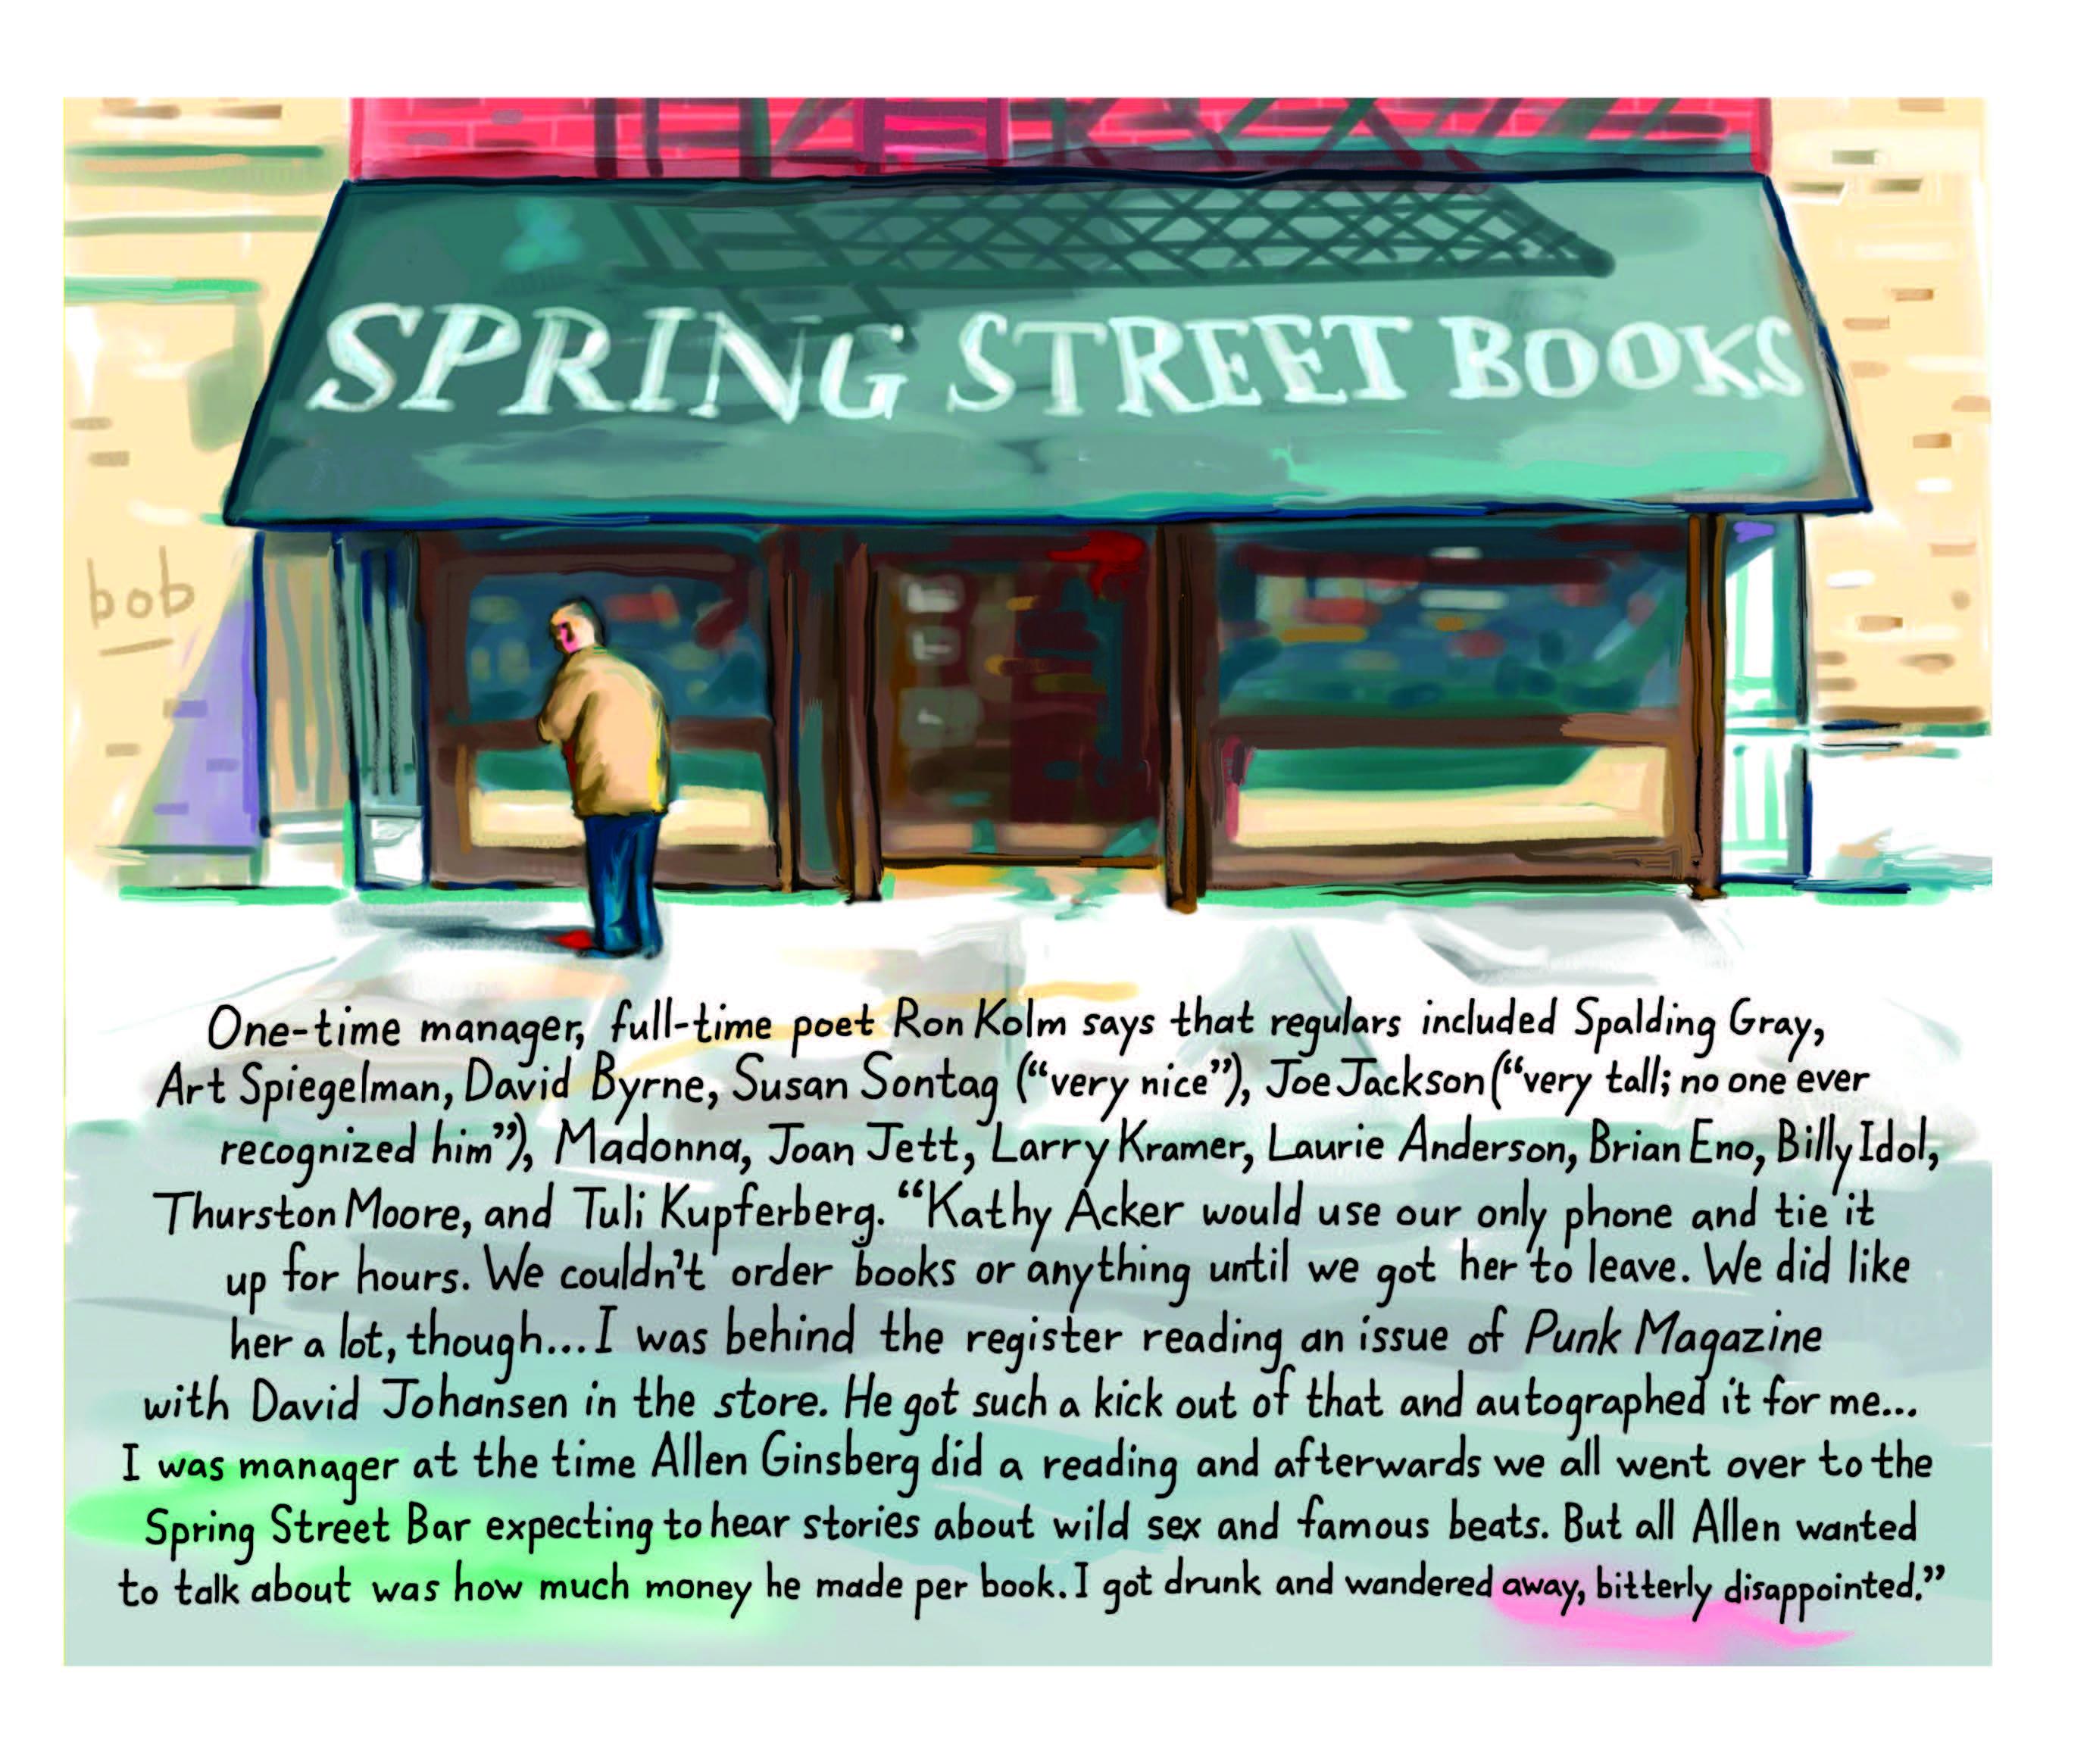 Bob Eckstein Bookstores